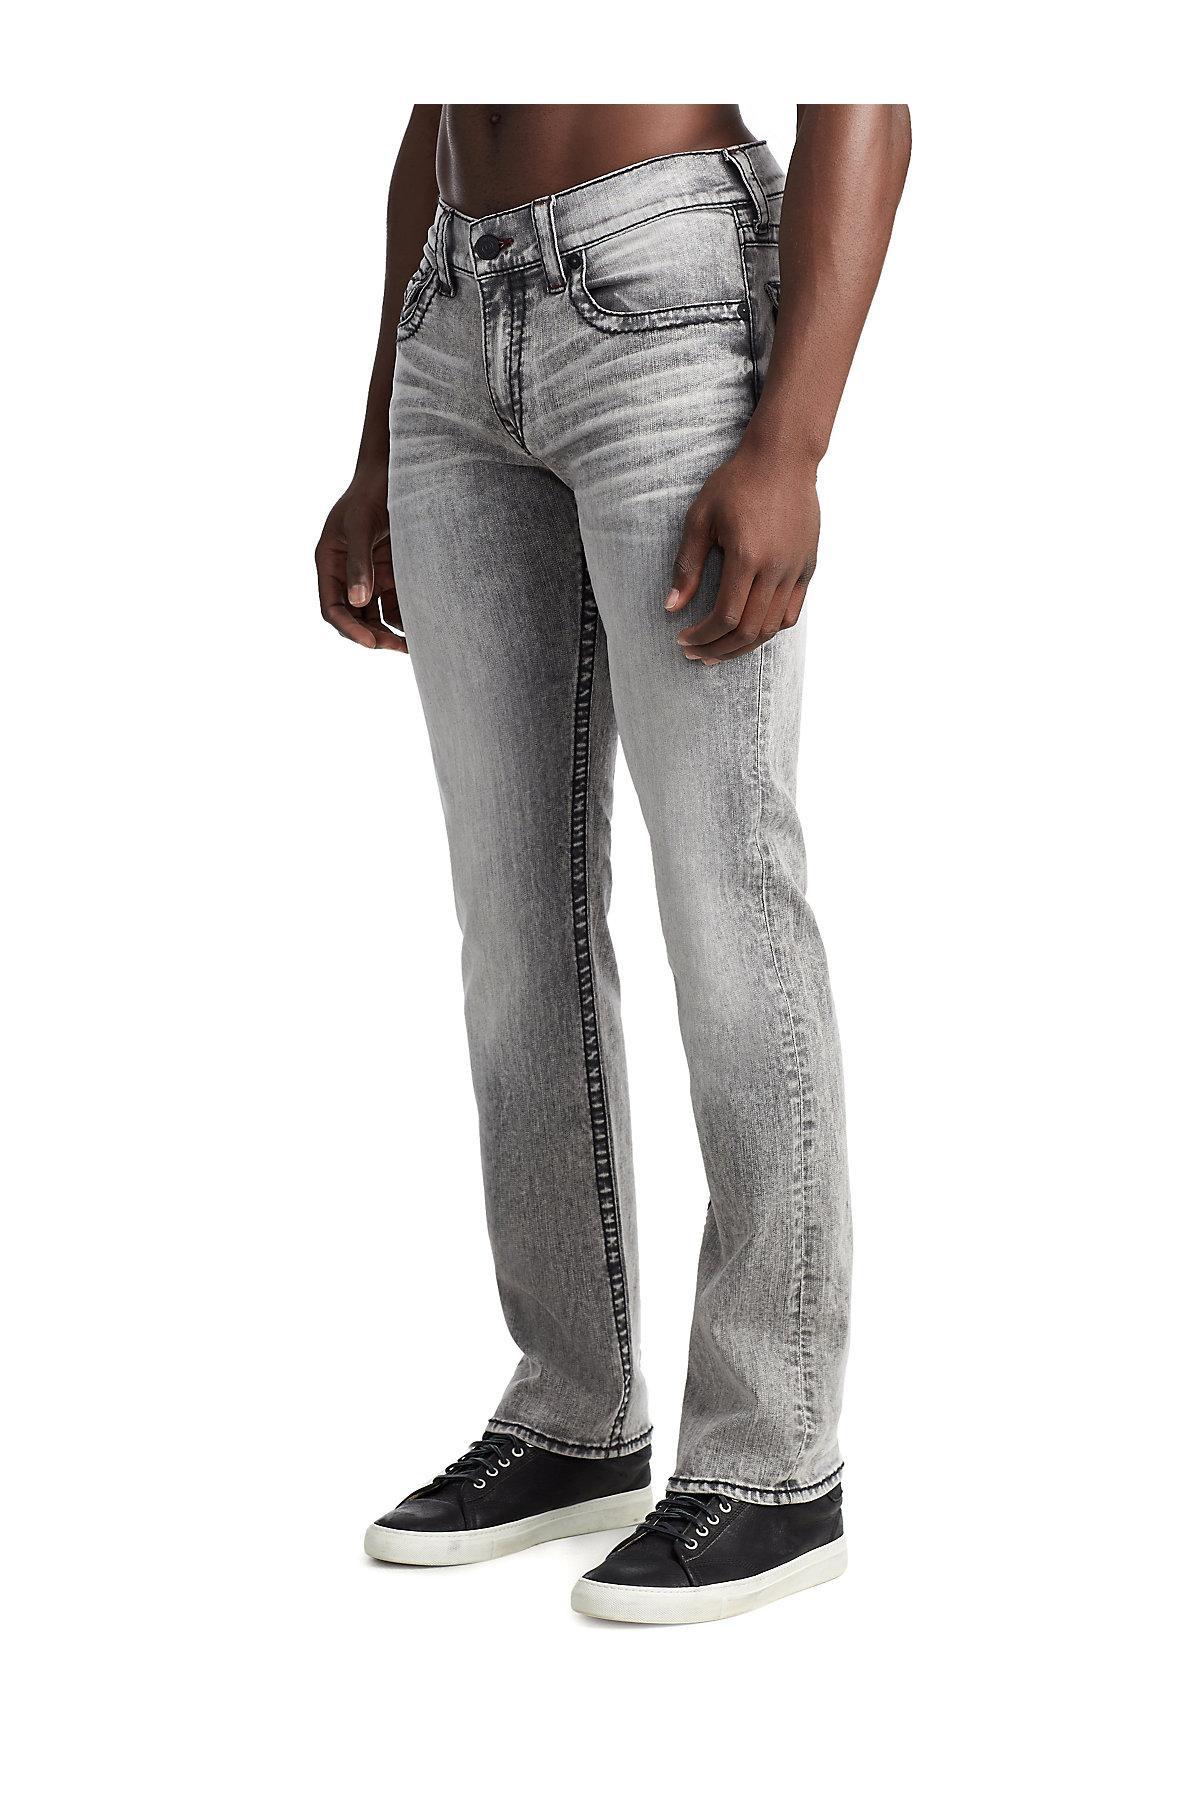 9427a0ee2 True Religion - Gray Ricky Straight Big T Jean for Men - Lyst. View  fullscreen